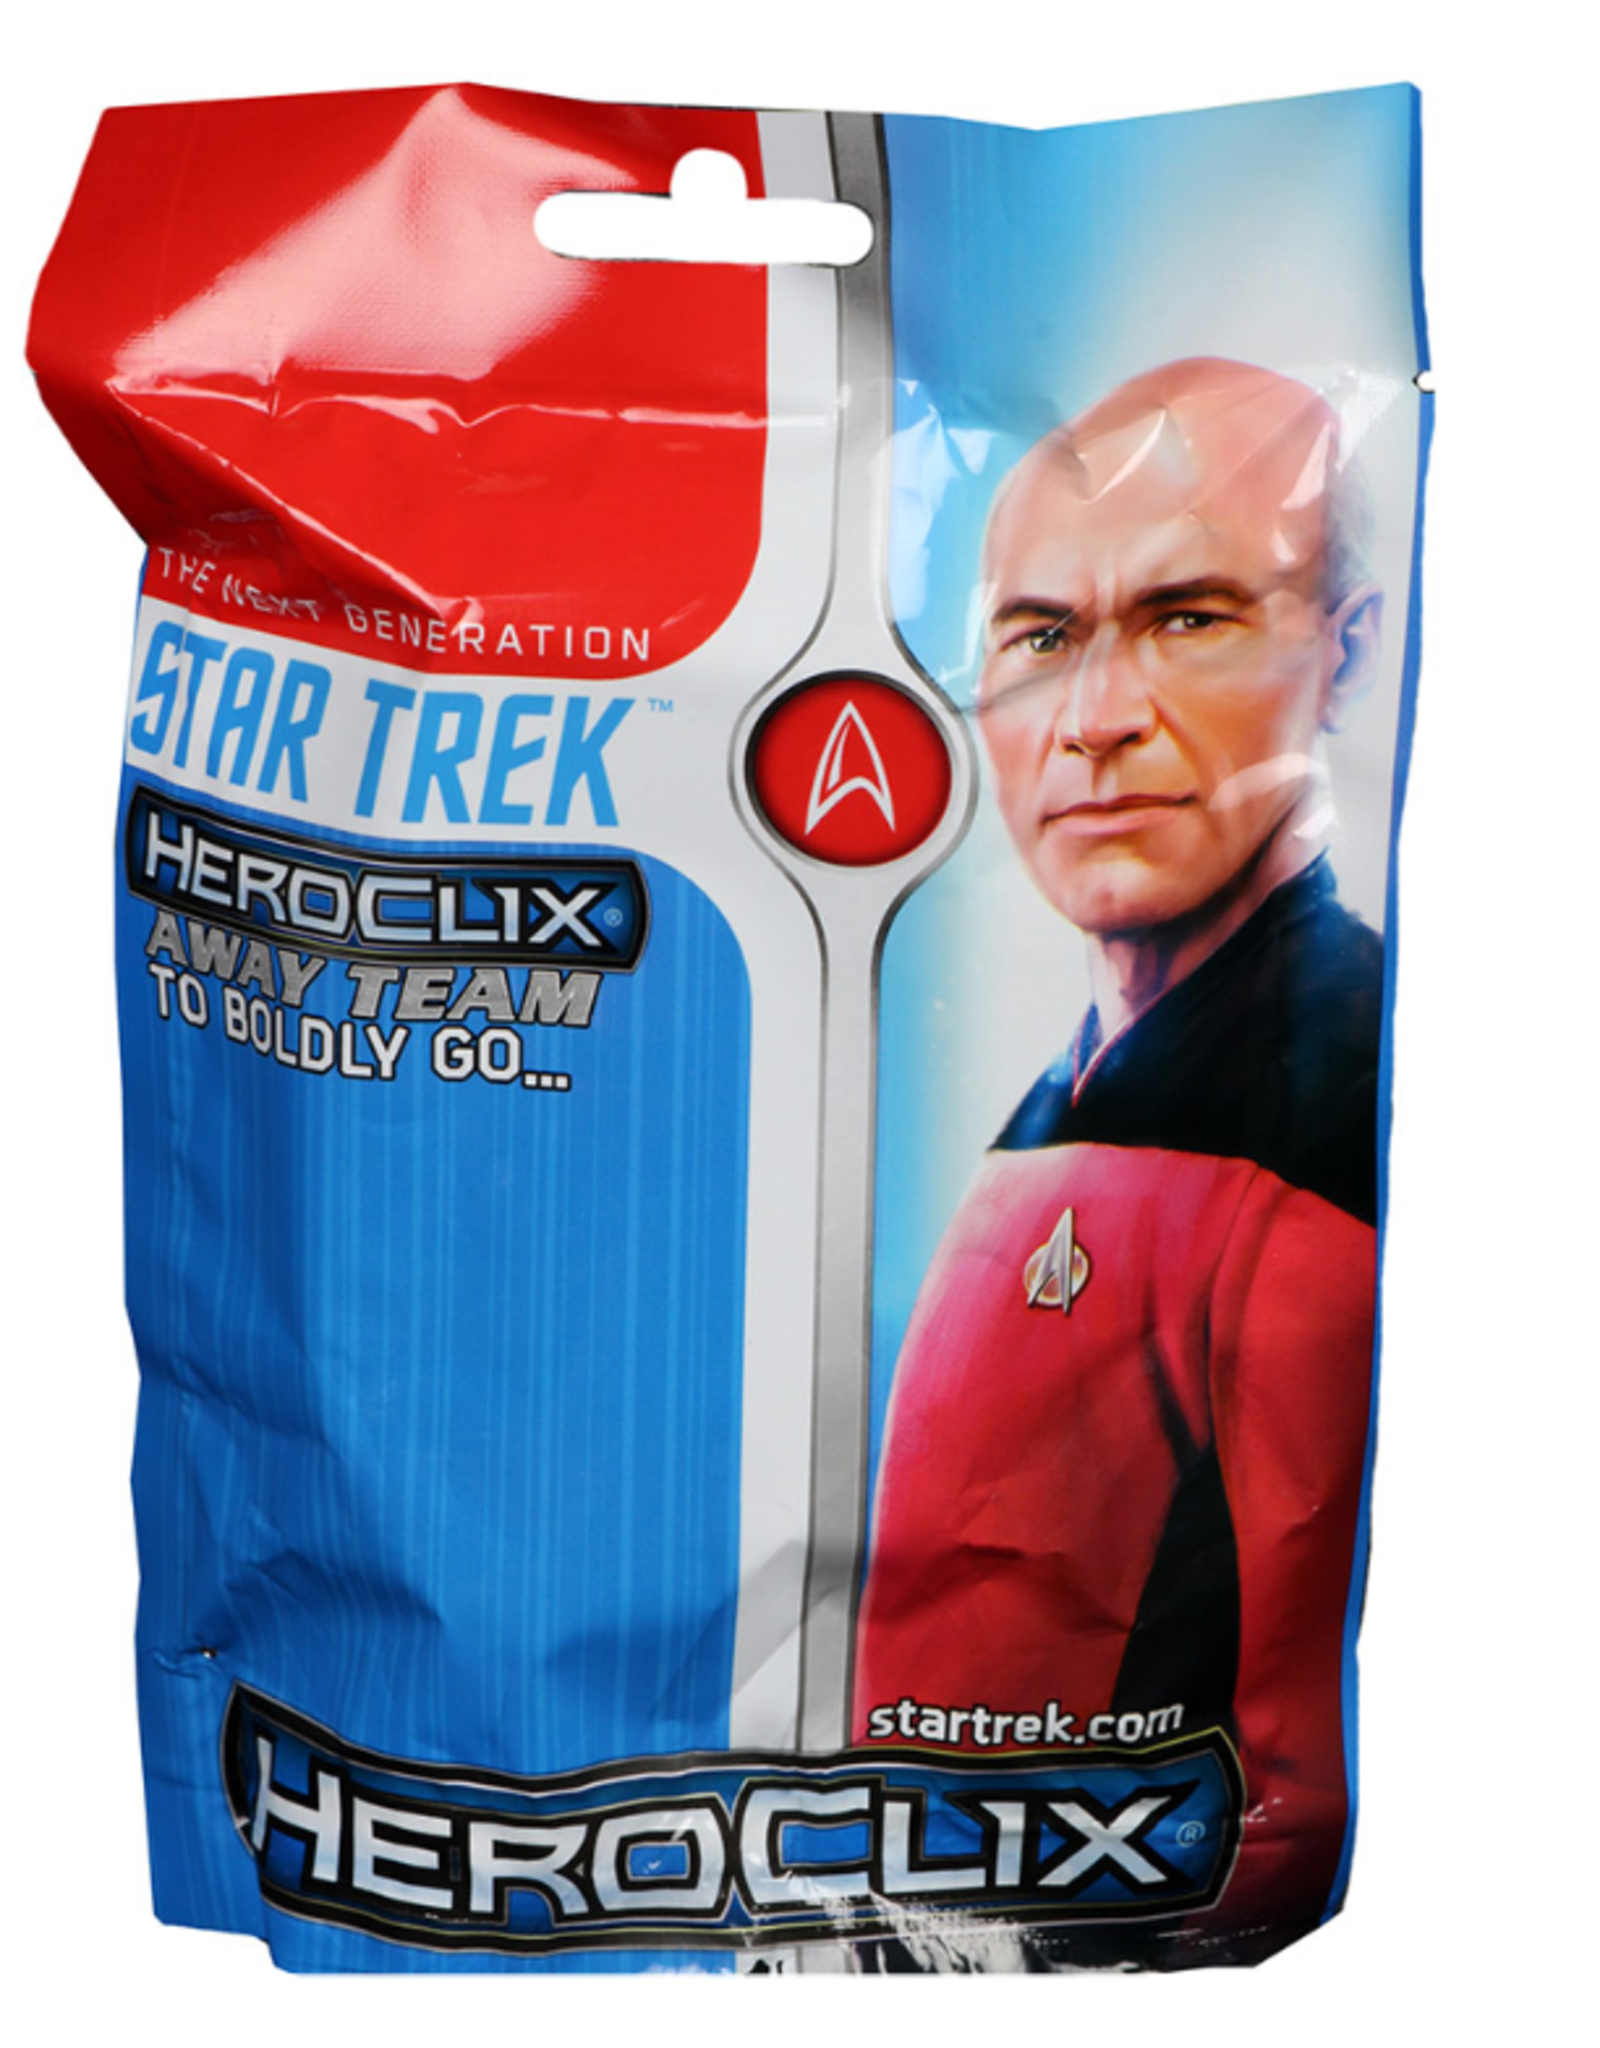 Wizkids Star Trek HeroClix Away Team: The Next Generation - To Boldly Go Pack